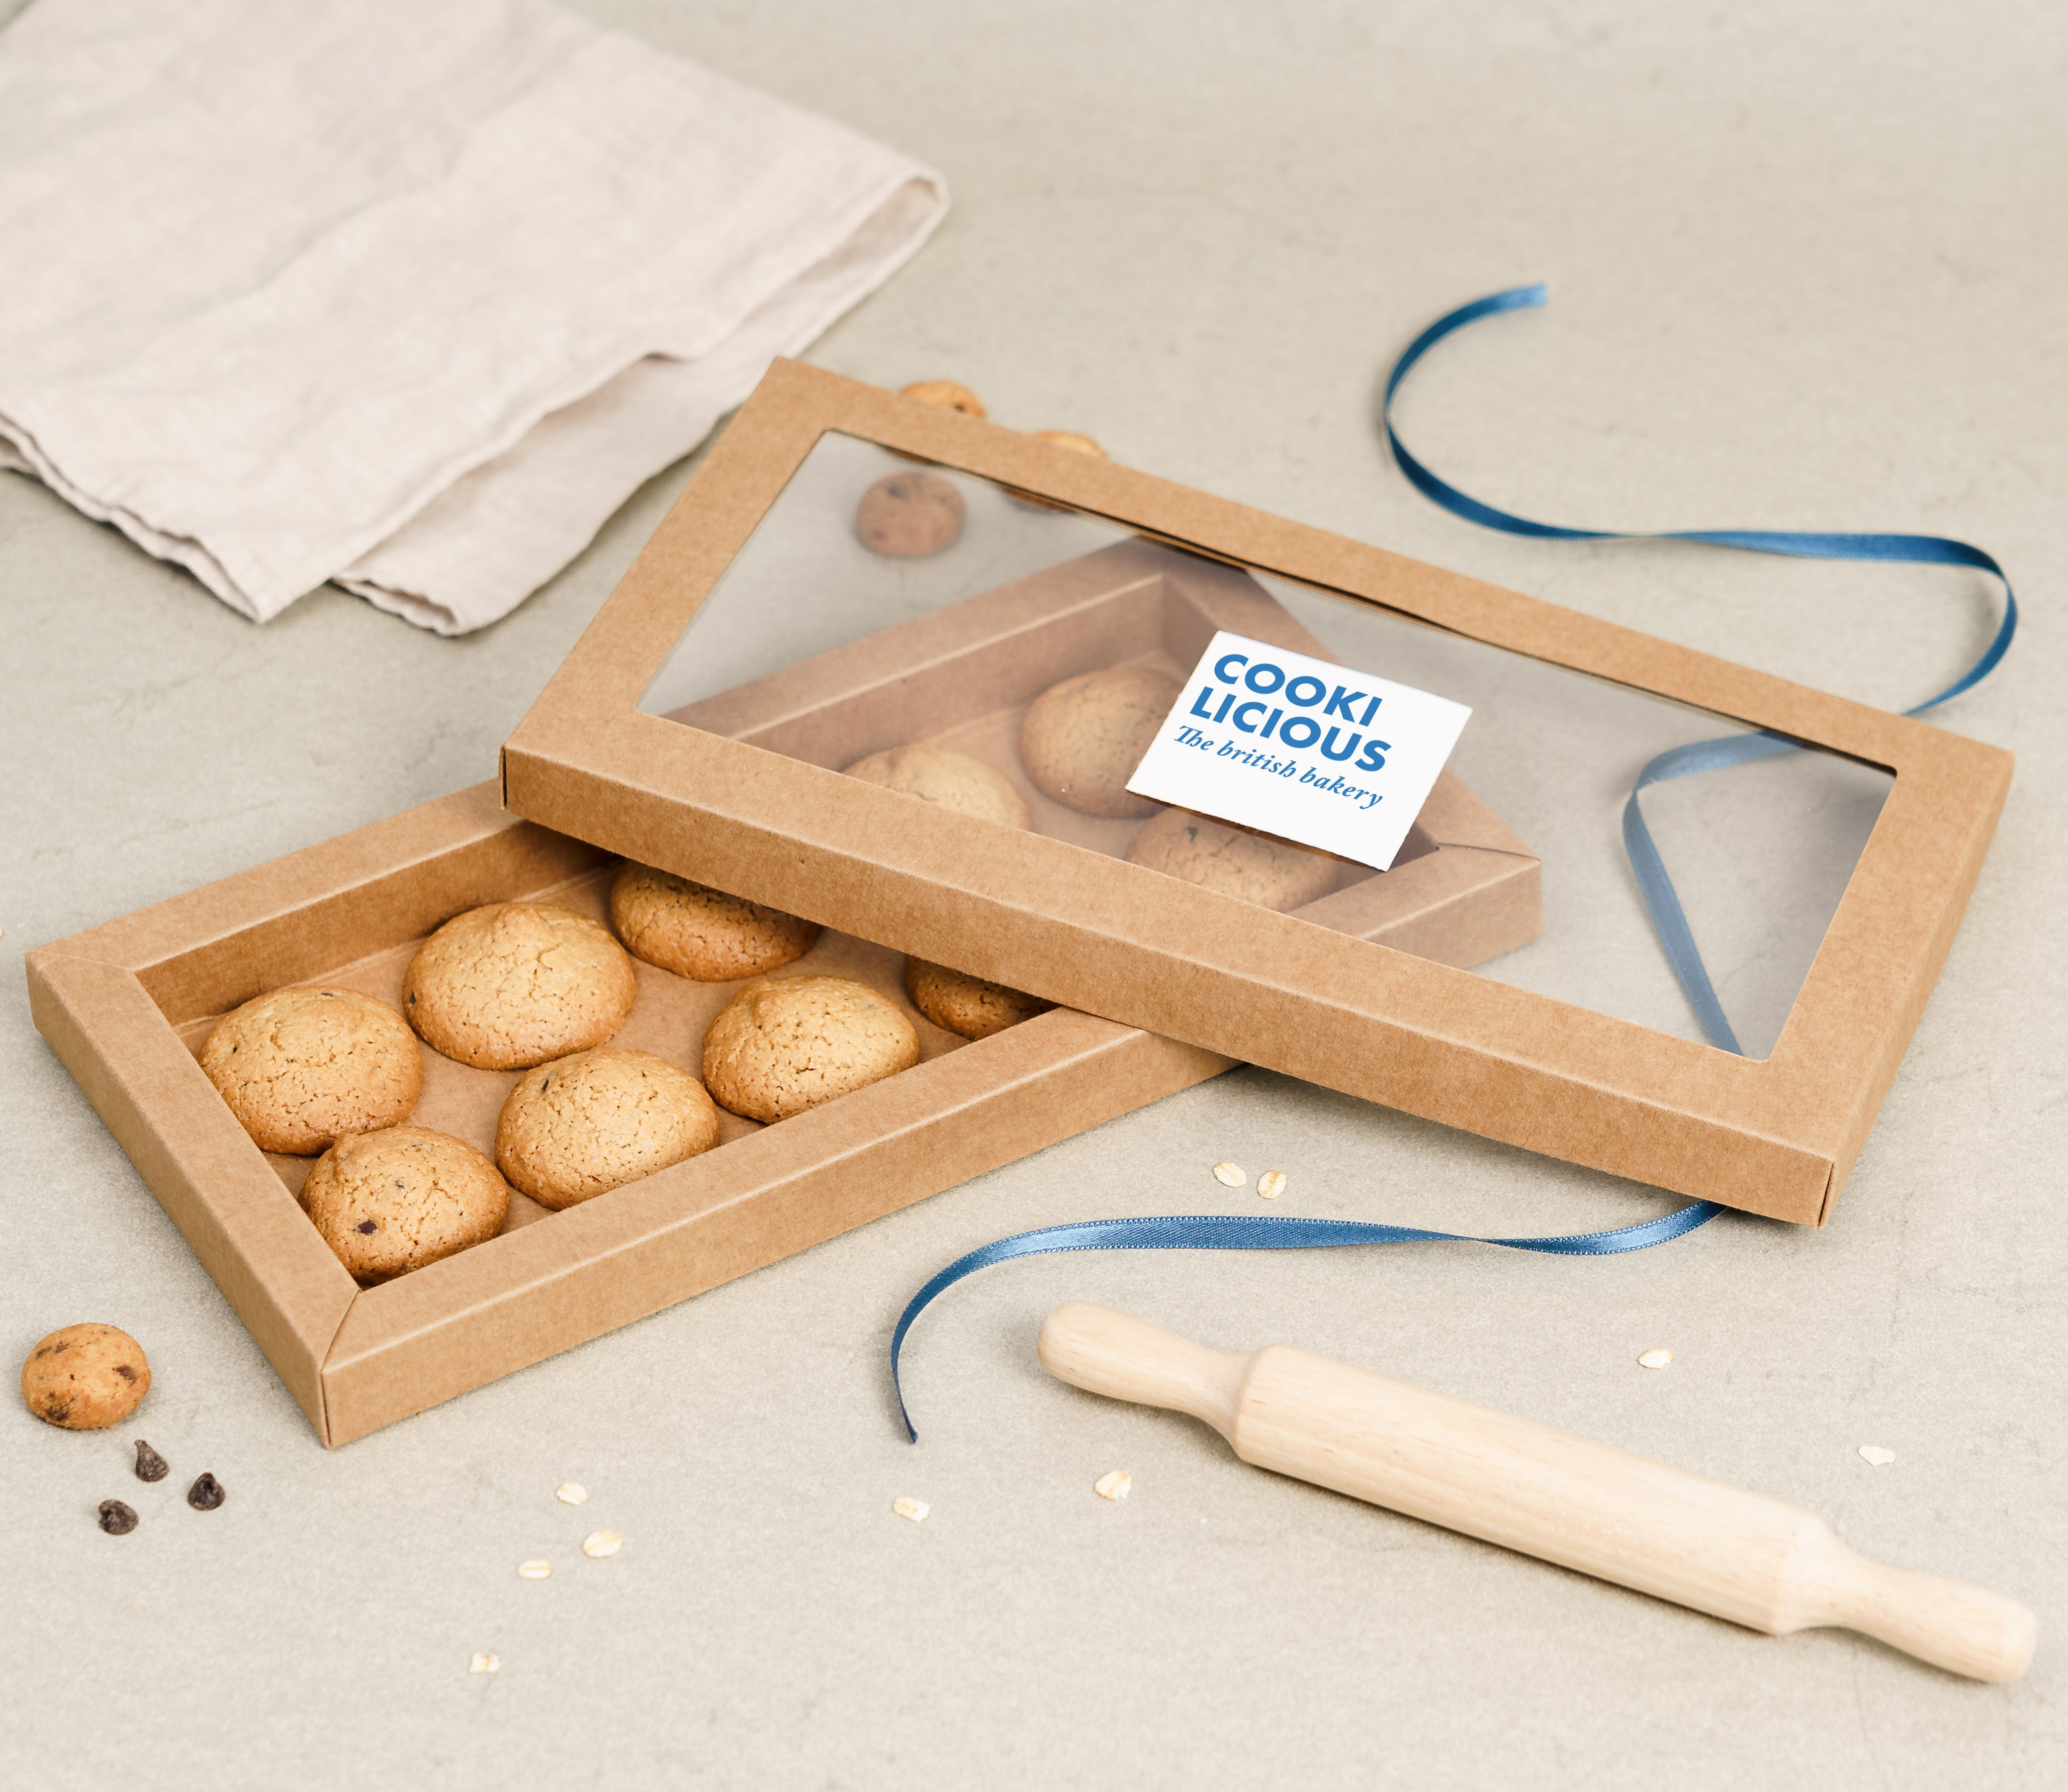 250 Ideas De Packaging En 2021 Cajas Empaques Moldes De Caja Cajas De Regalo